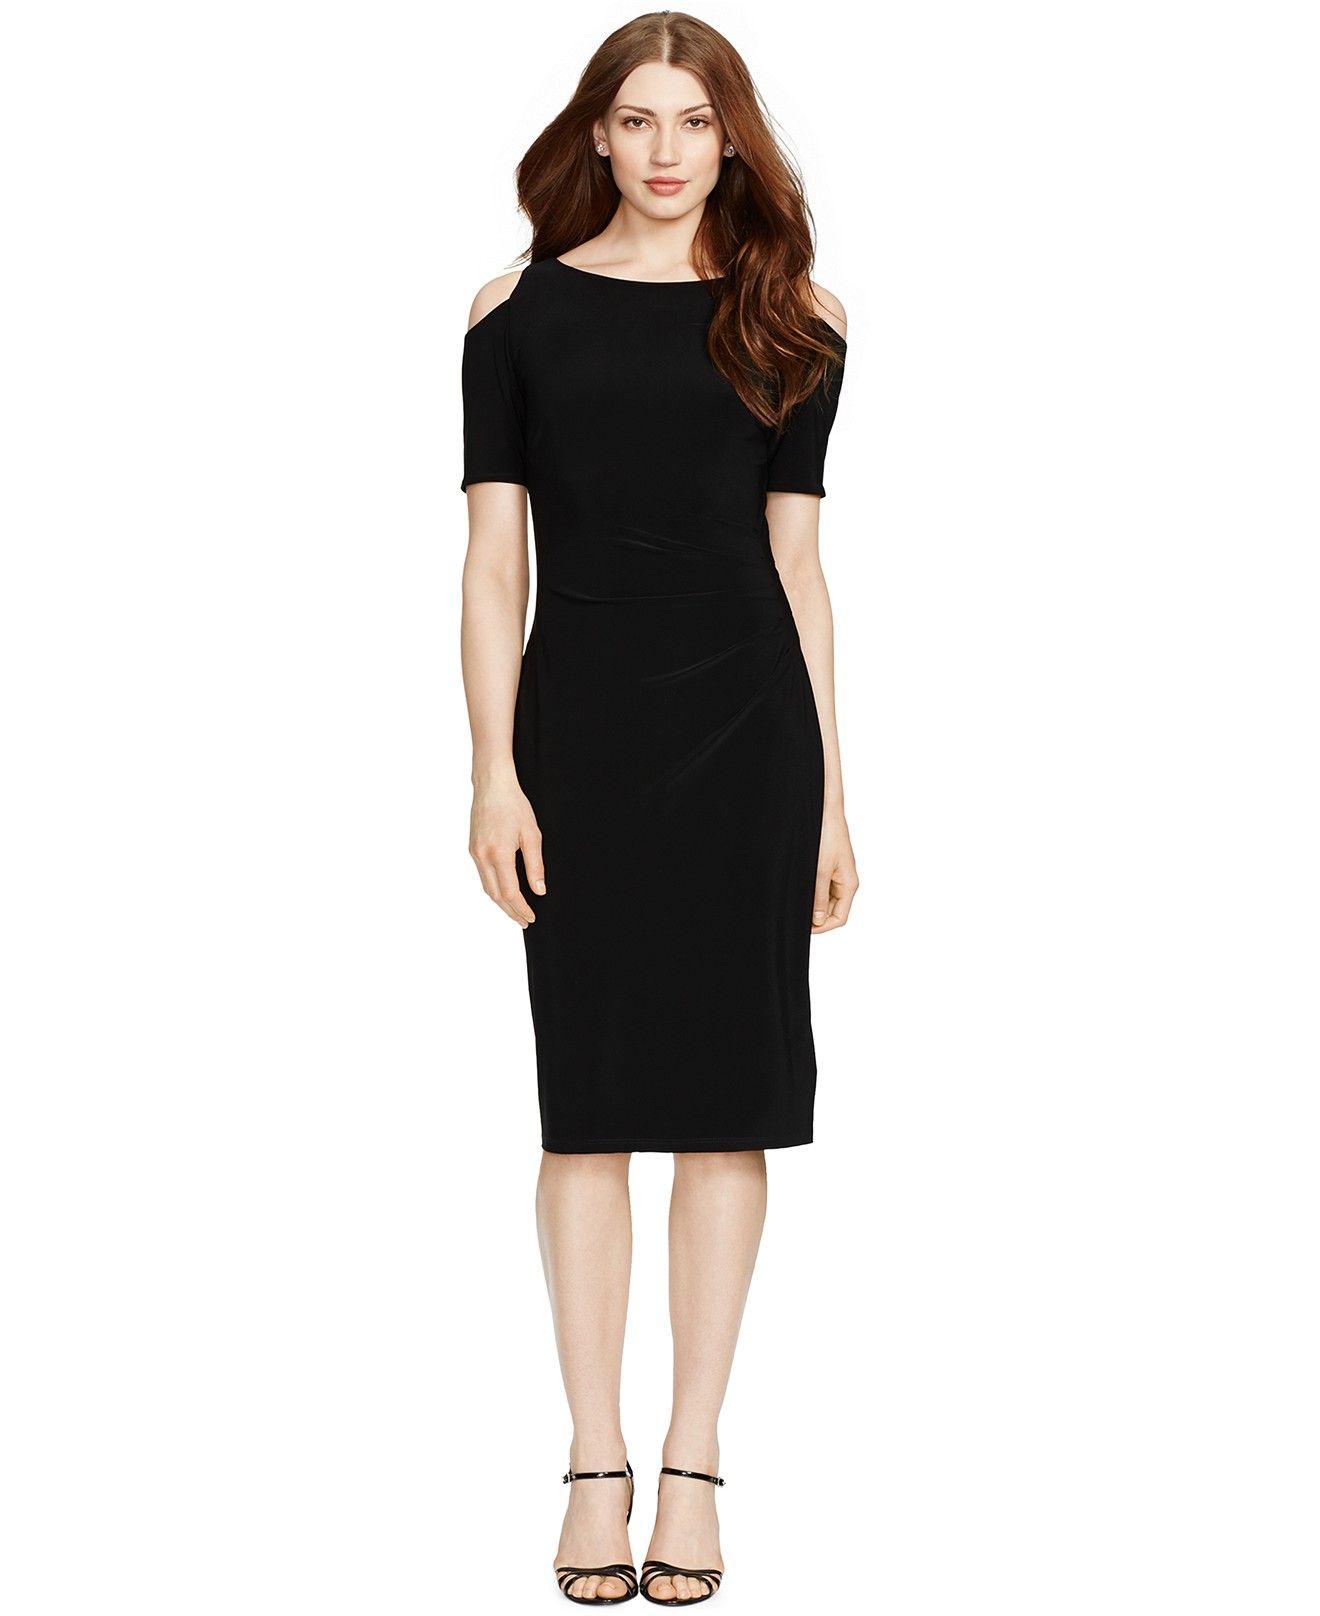 Lauren ralph lauren coldshoulder sheath dress dresses